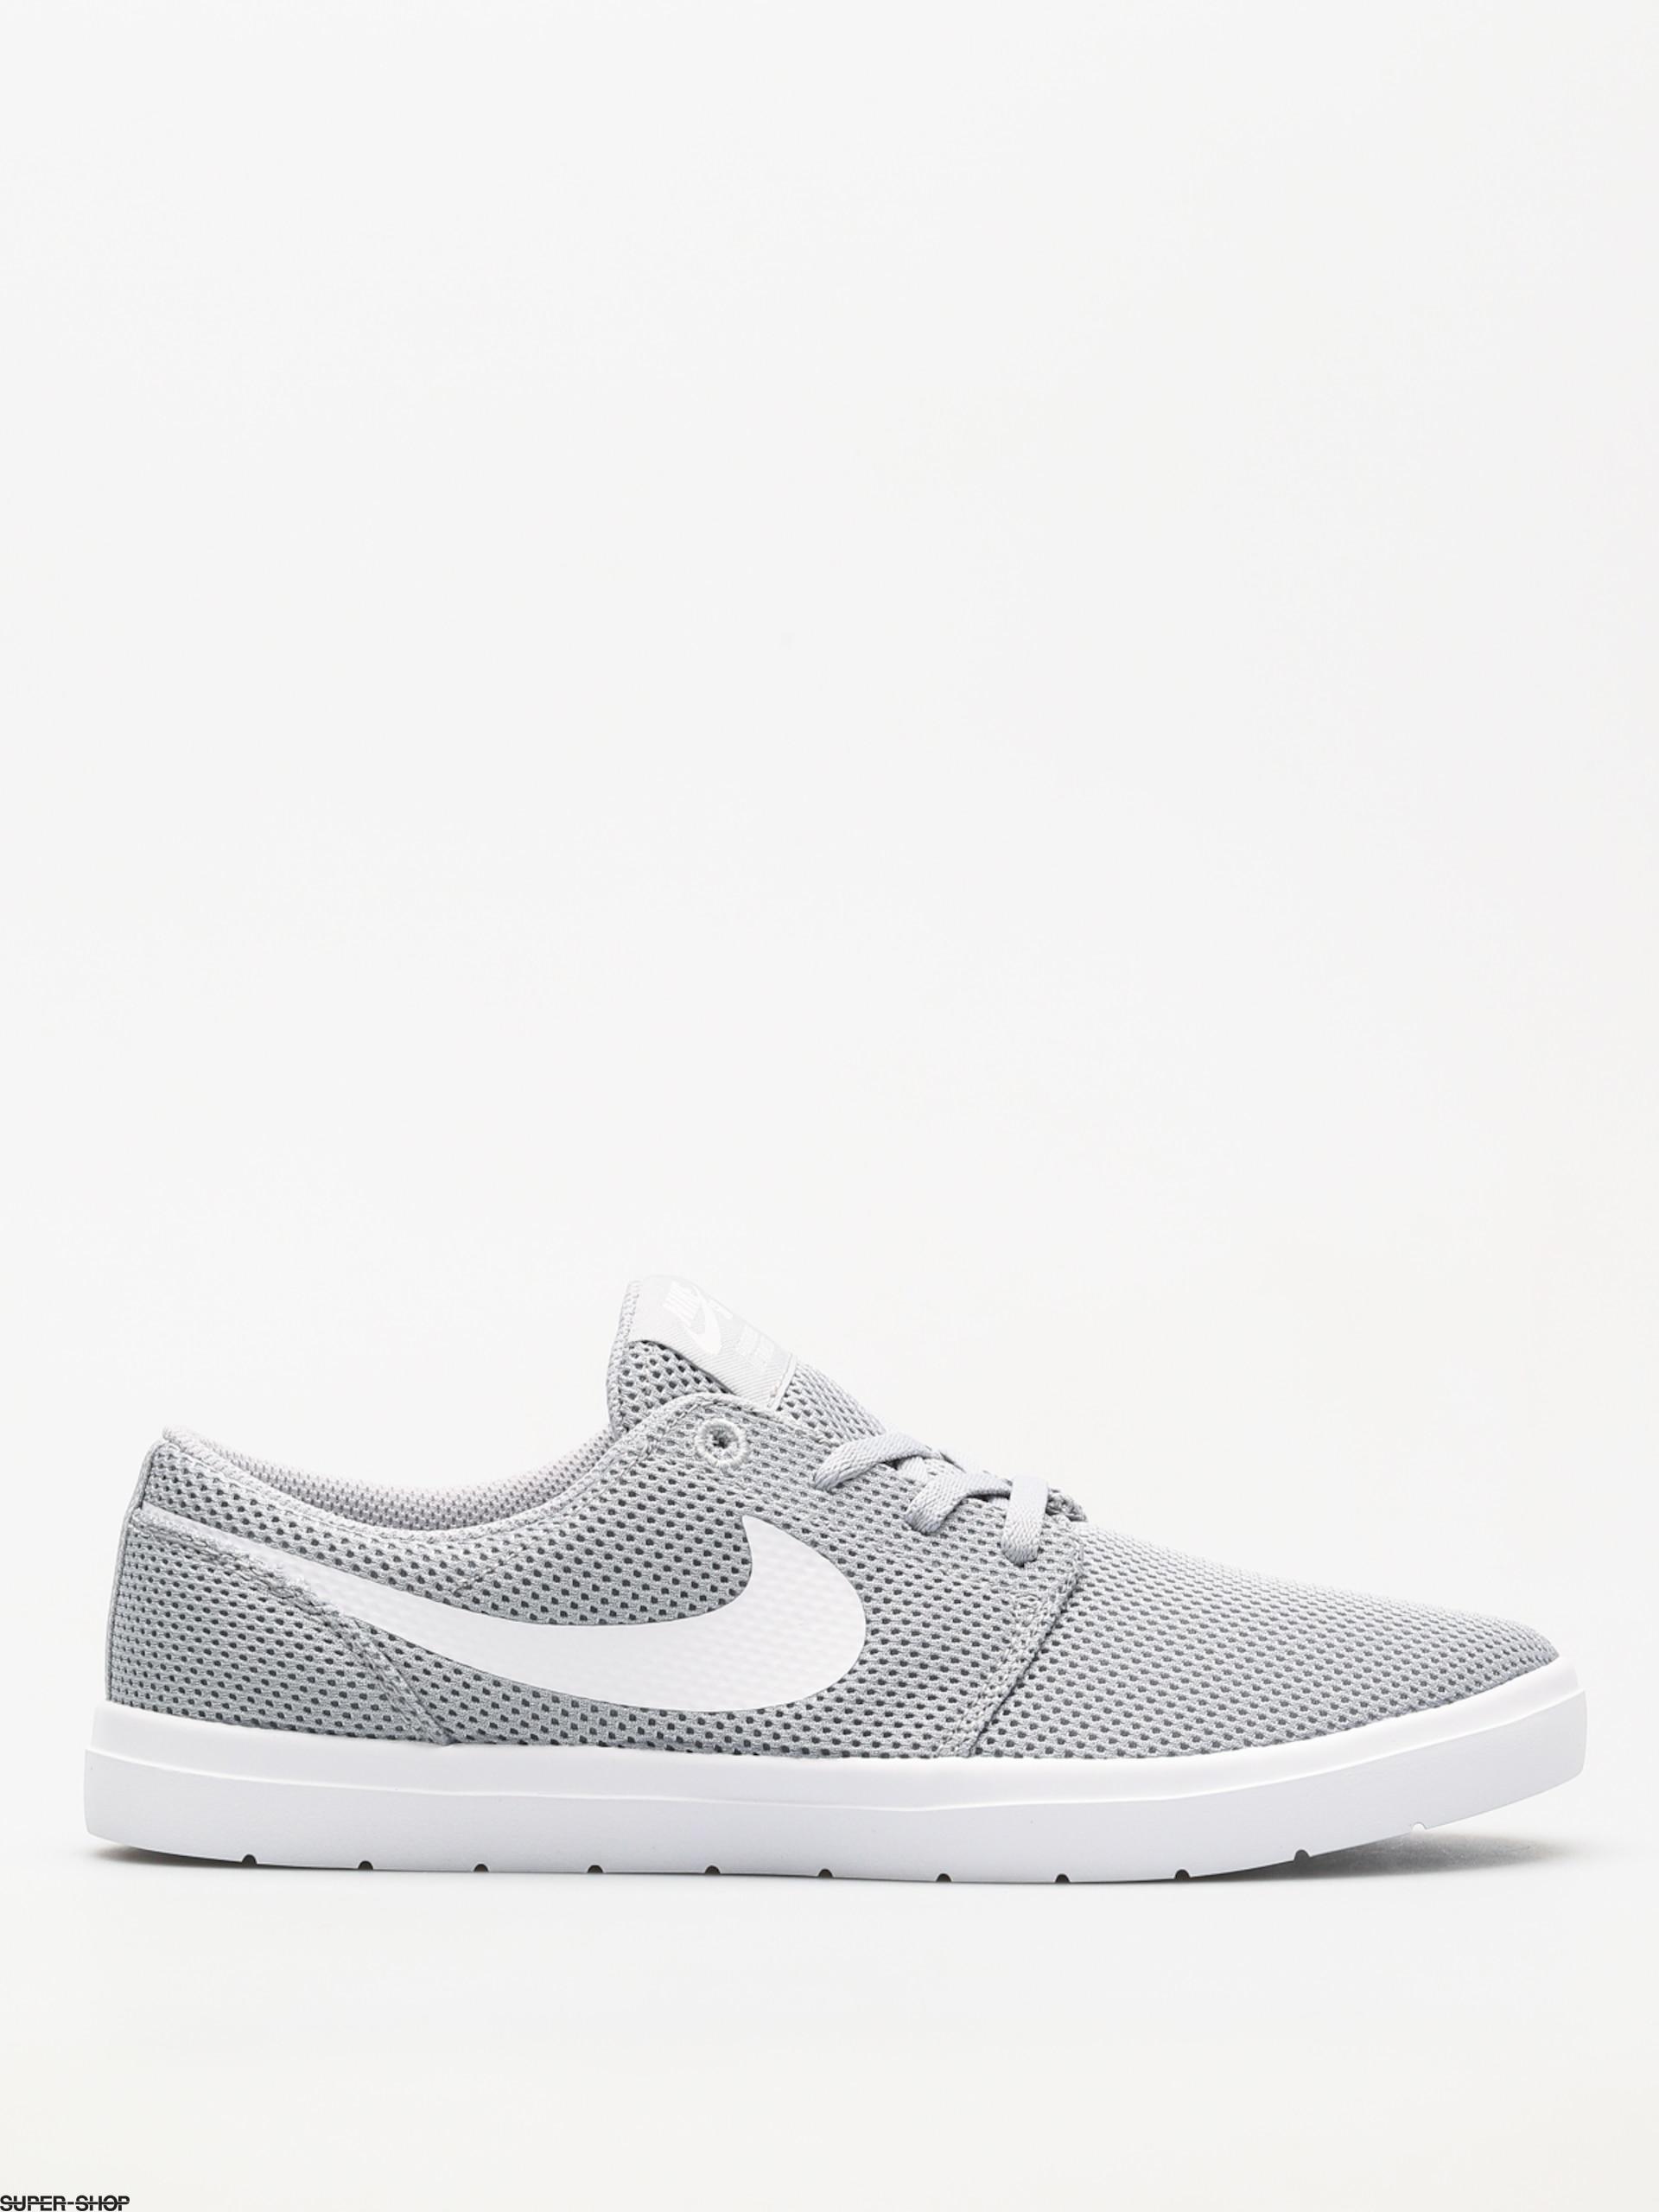 c57f14fba9919f Nike SB Shoes Sb Portmore II Ultralight (wolf grey white)